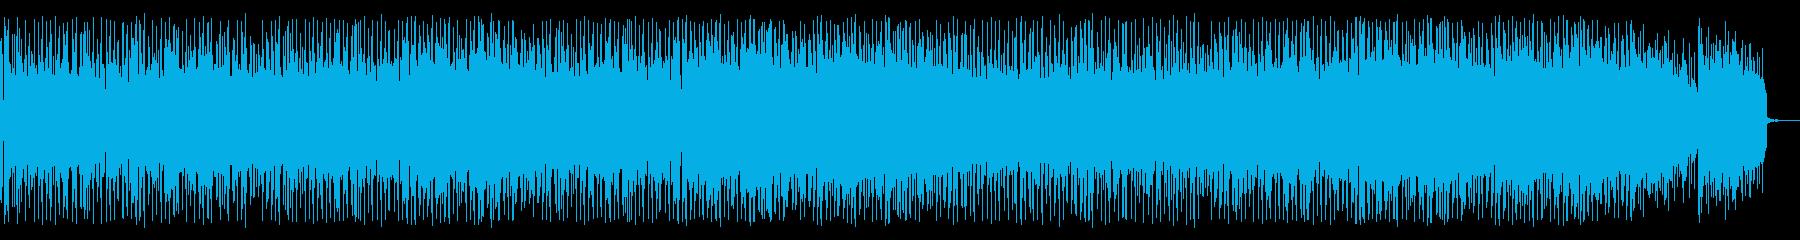 FMで流れてそうな爽やか系スムースジャズの再生済みの波形